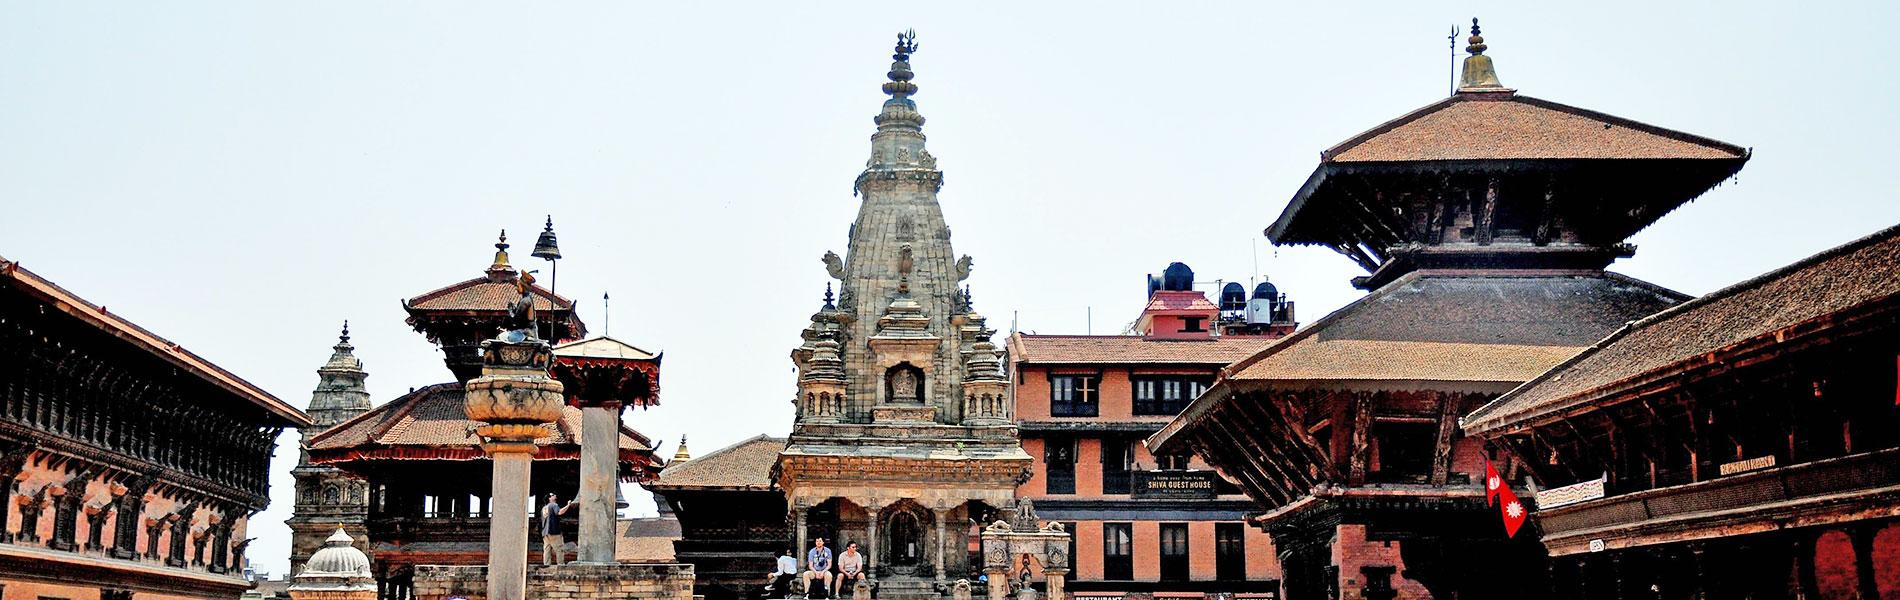 Durbar Square in Nepal